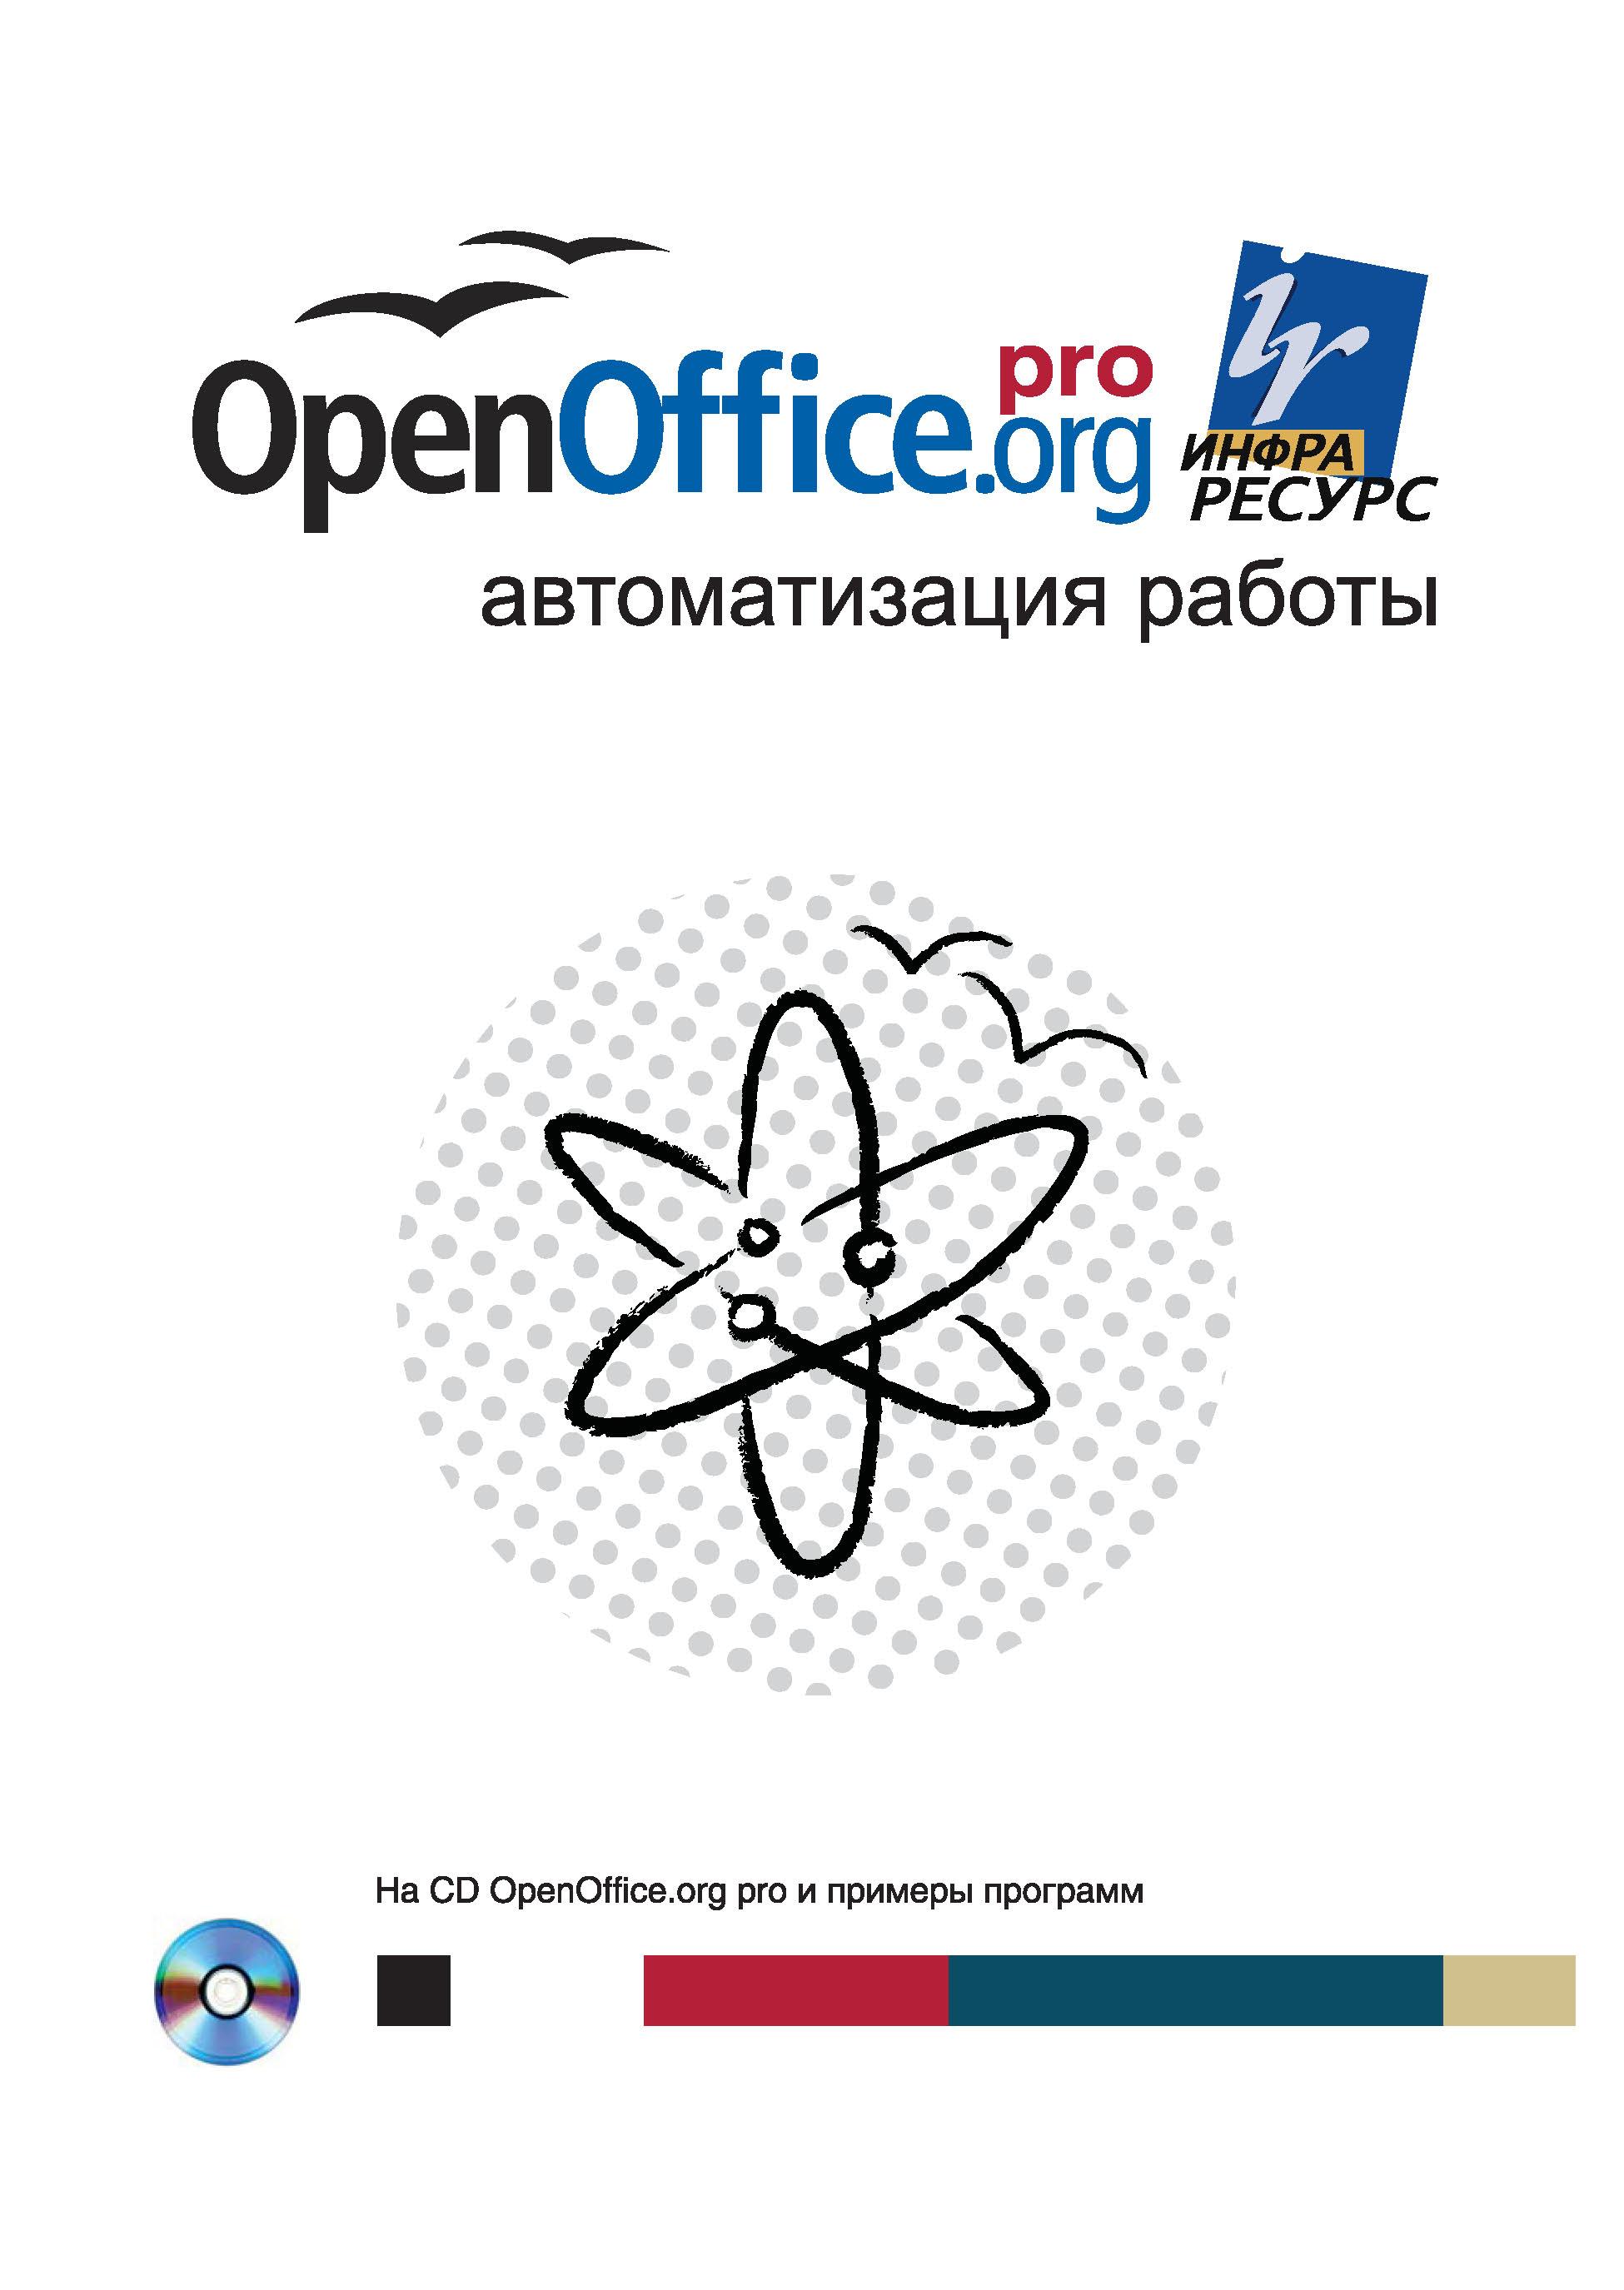 Эндрю Питоньяк OpenOffice.org pro. Автоматизация работы хамфри эндрю пекин